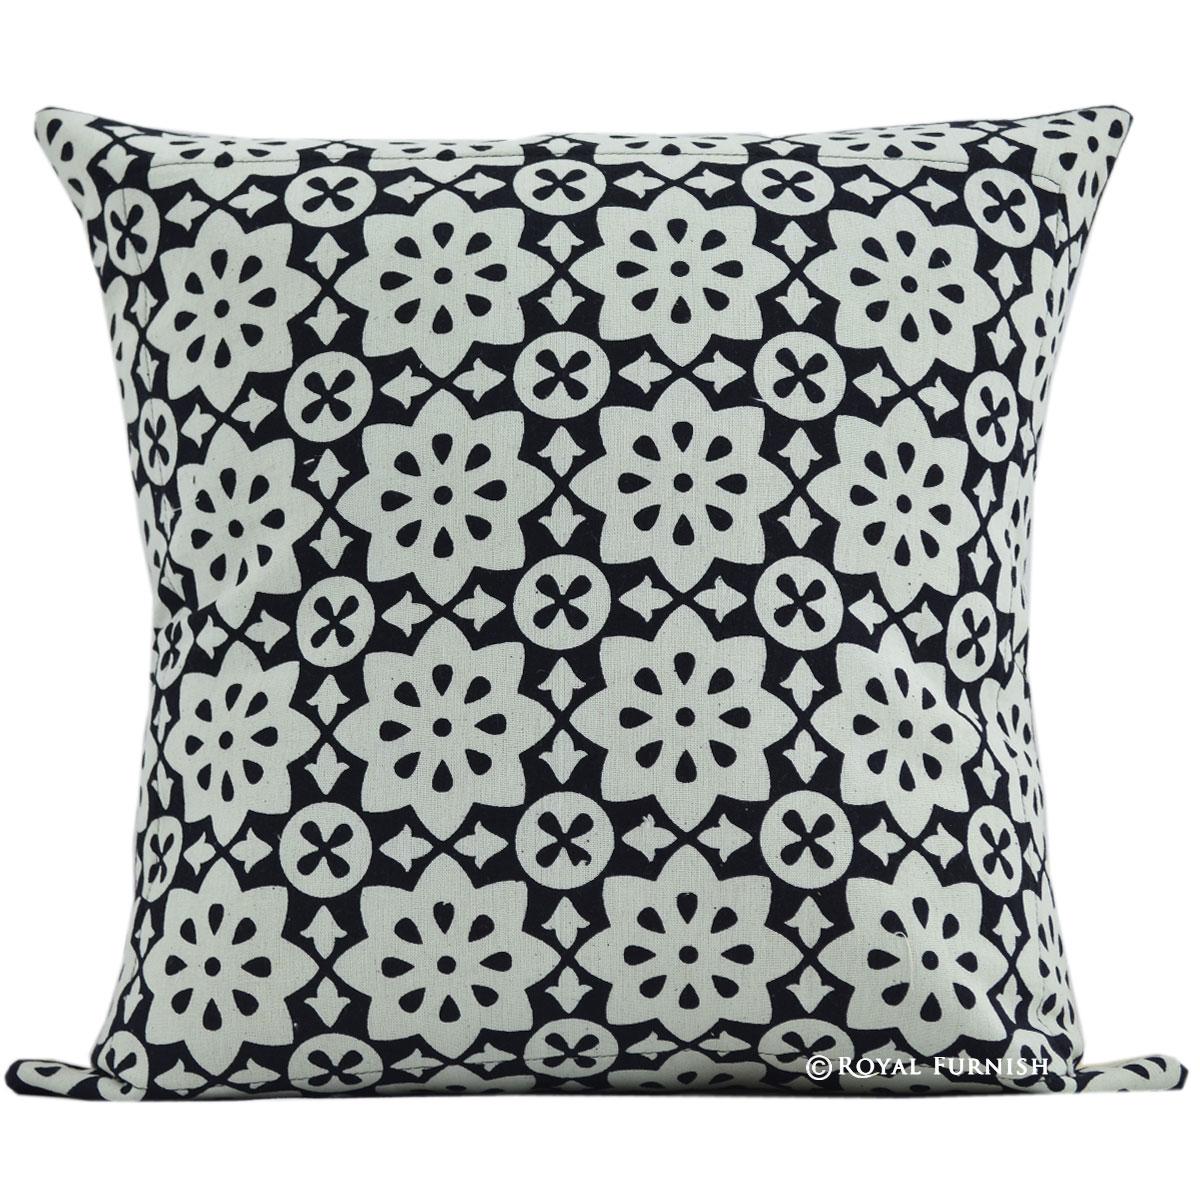 16 Quot Black Floral Hand Block Print Cotton Throw Pillow